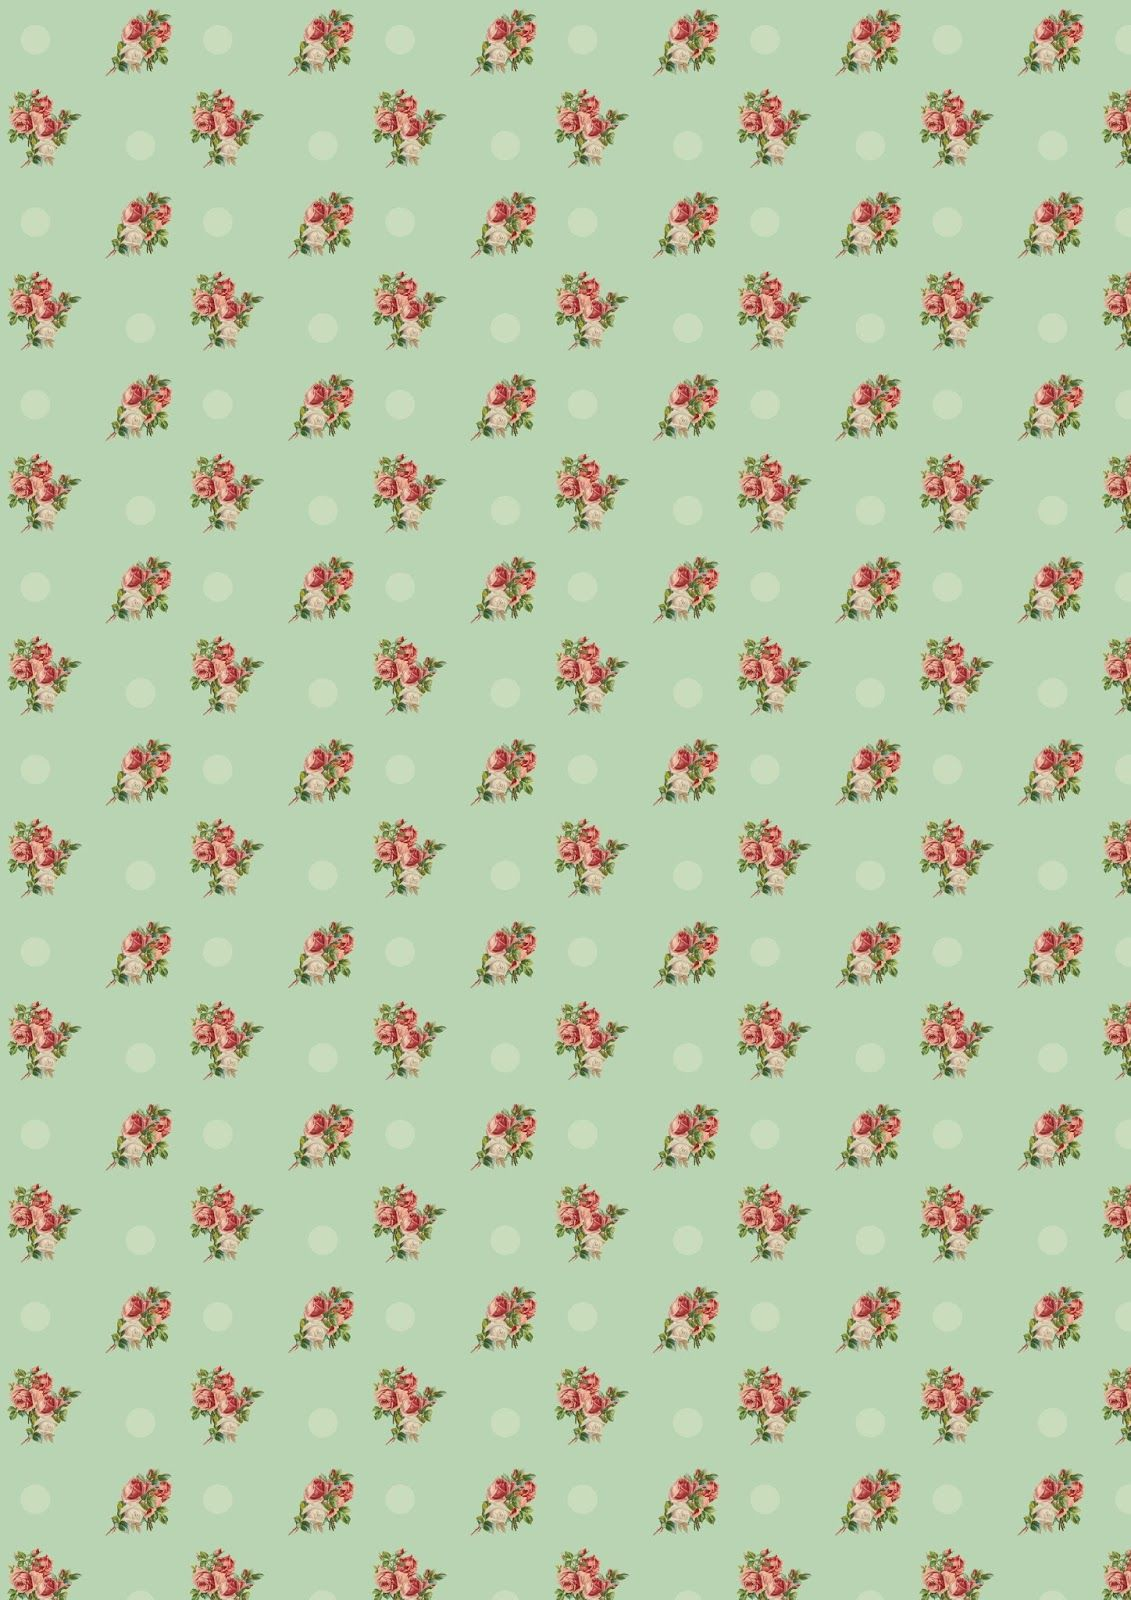 free printable floral vintage rose pattern paper with polka dot